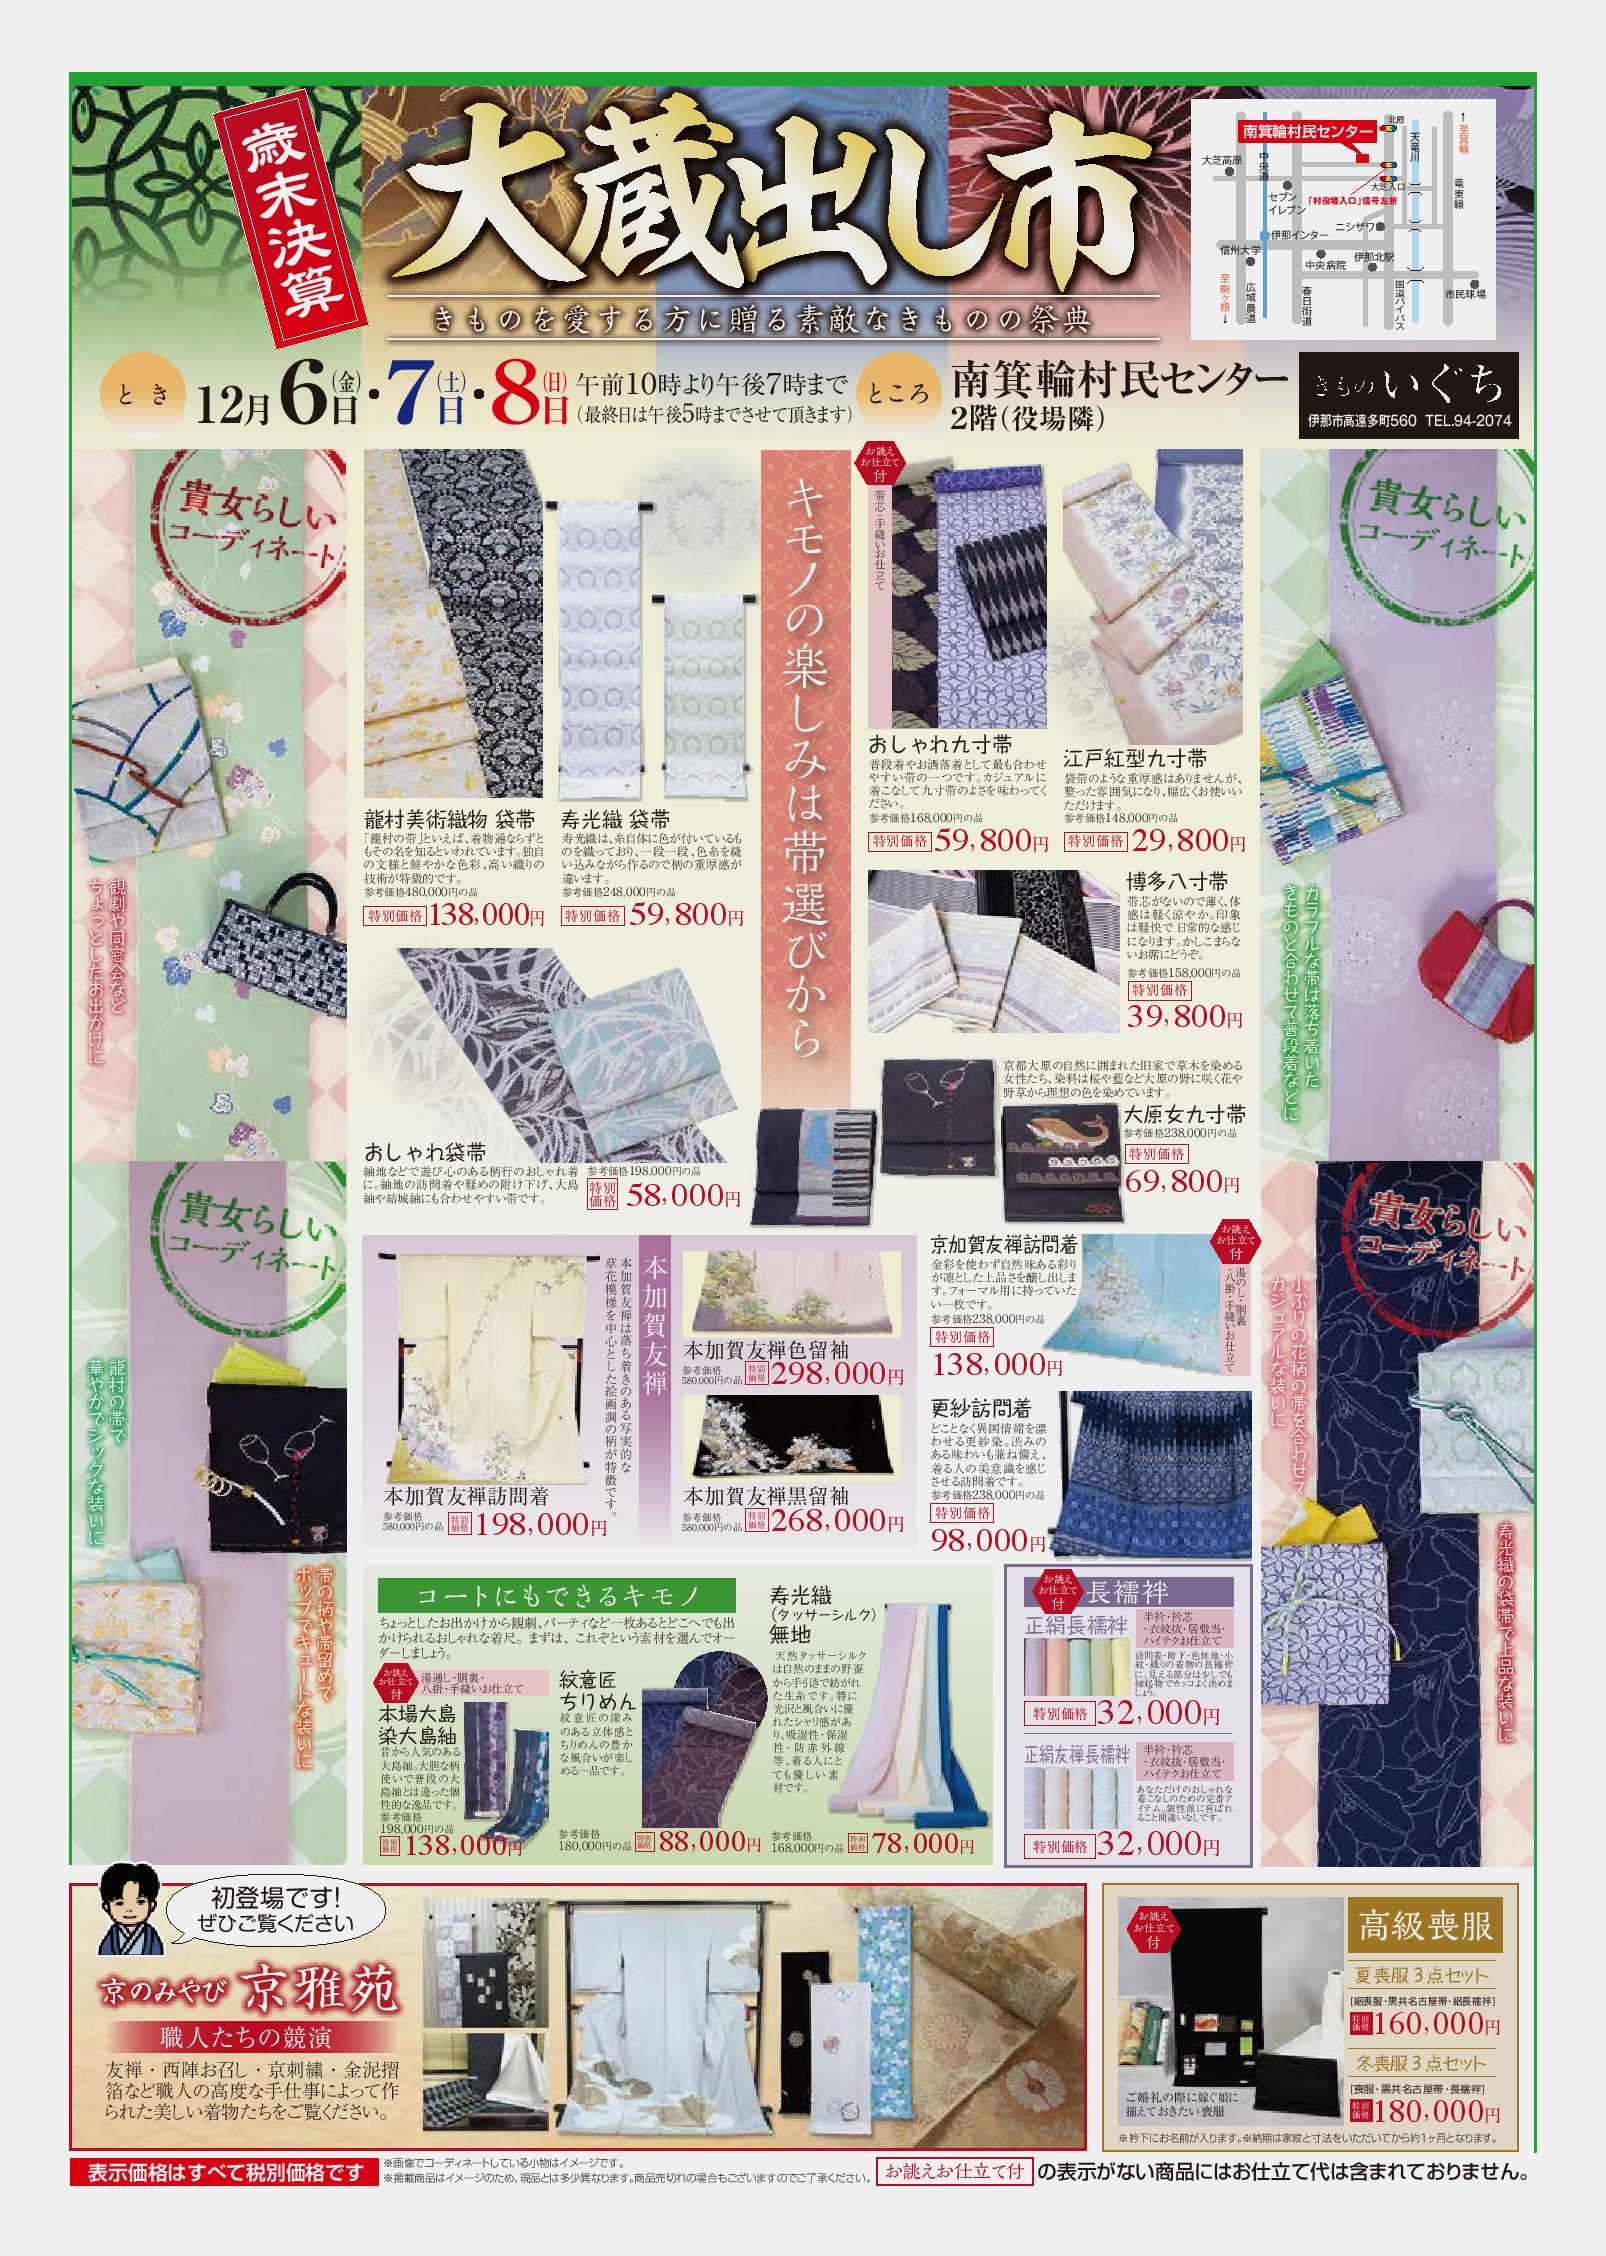 歳末決算大蔵出し市【12/6(金)~8(日)】